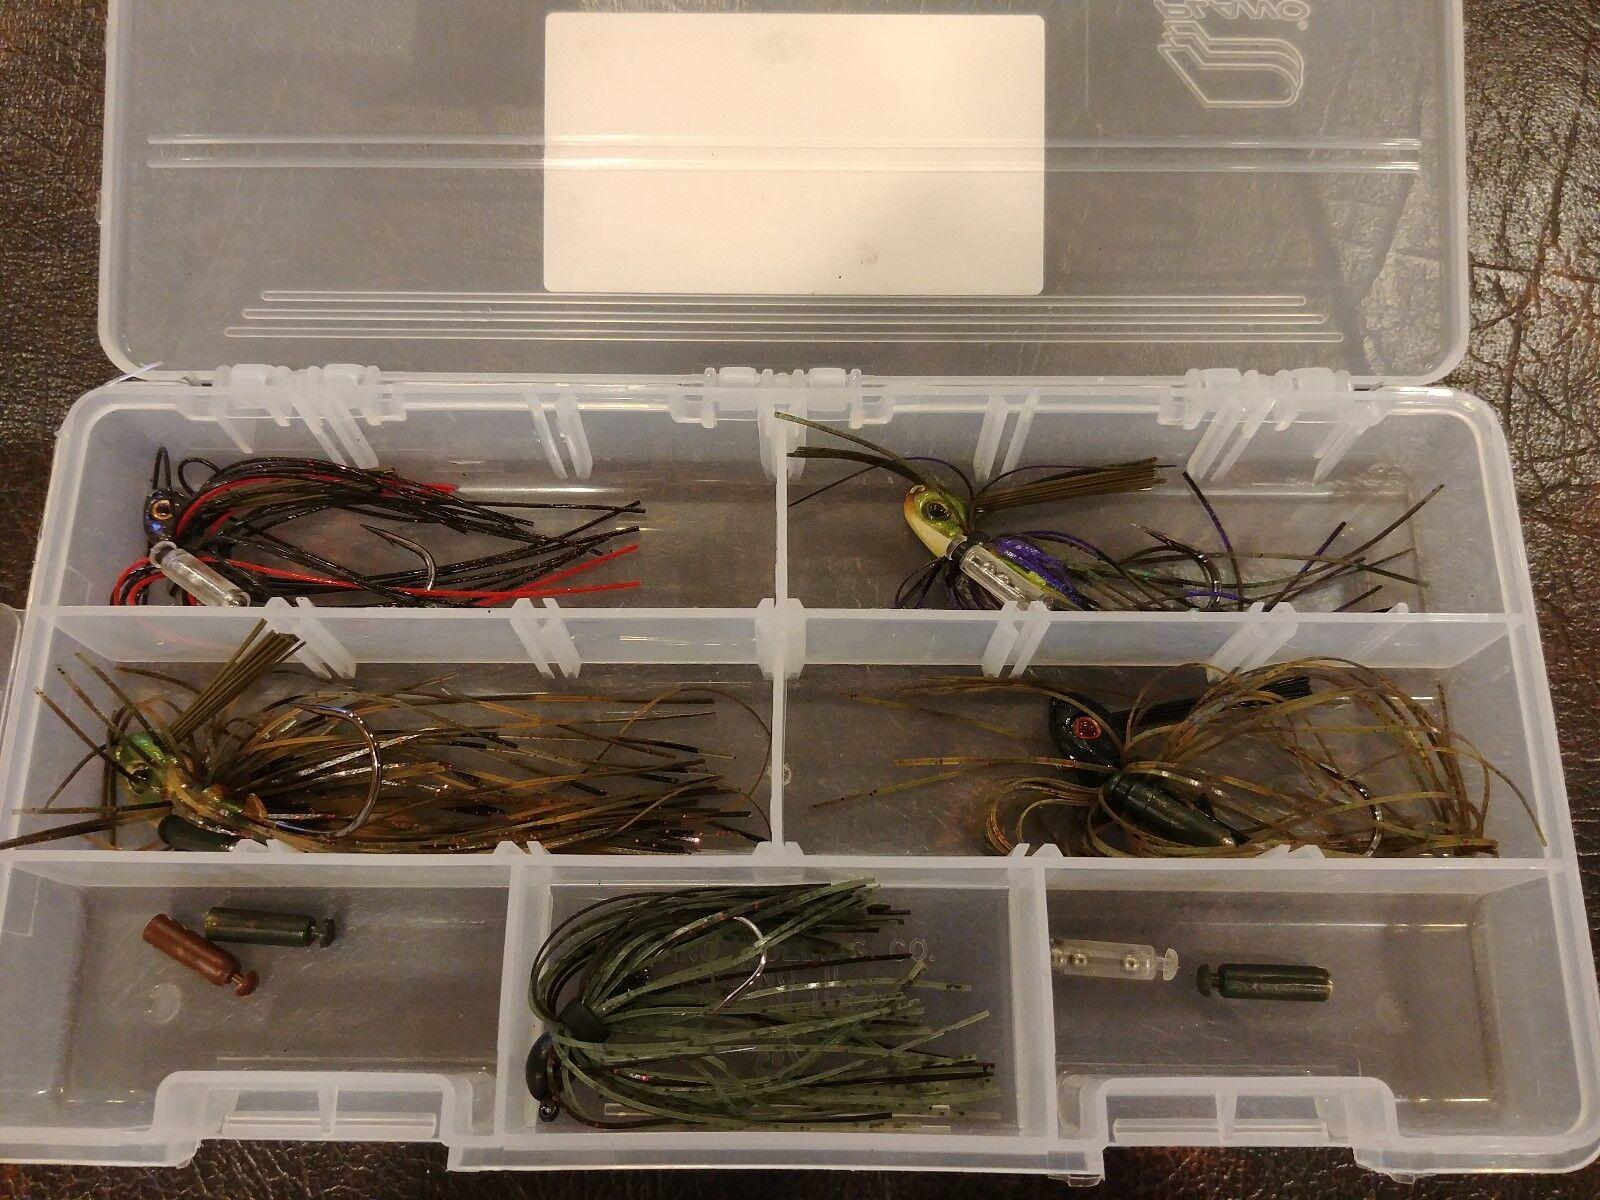 LCD Jigs 4 Pk 1 4 oz Box Set  Swim Jig Bait Fishing Lure Mustad Hook  select from the newest brands like